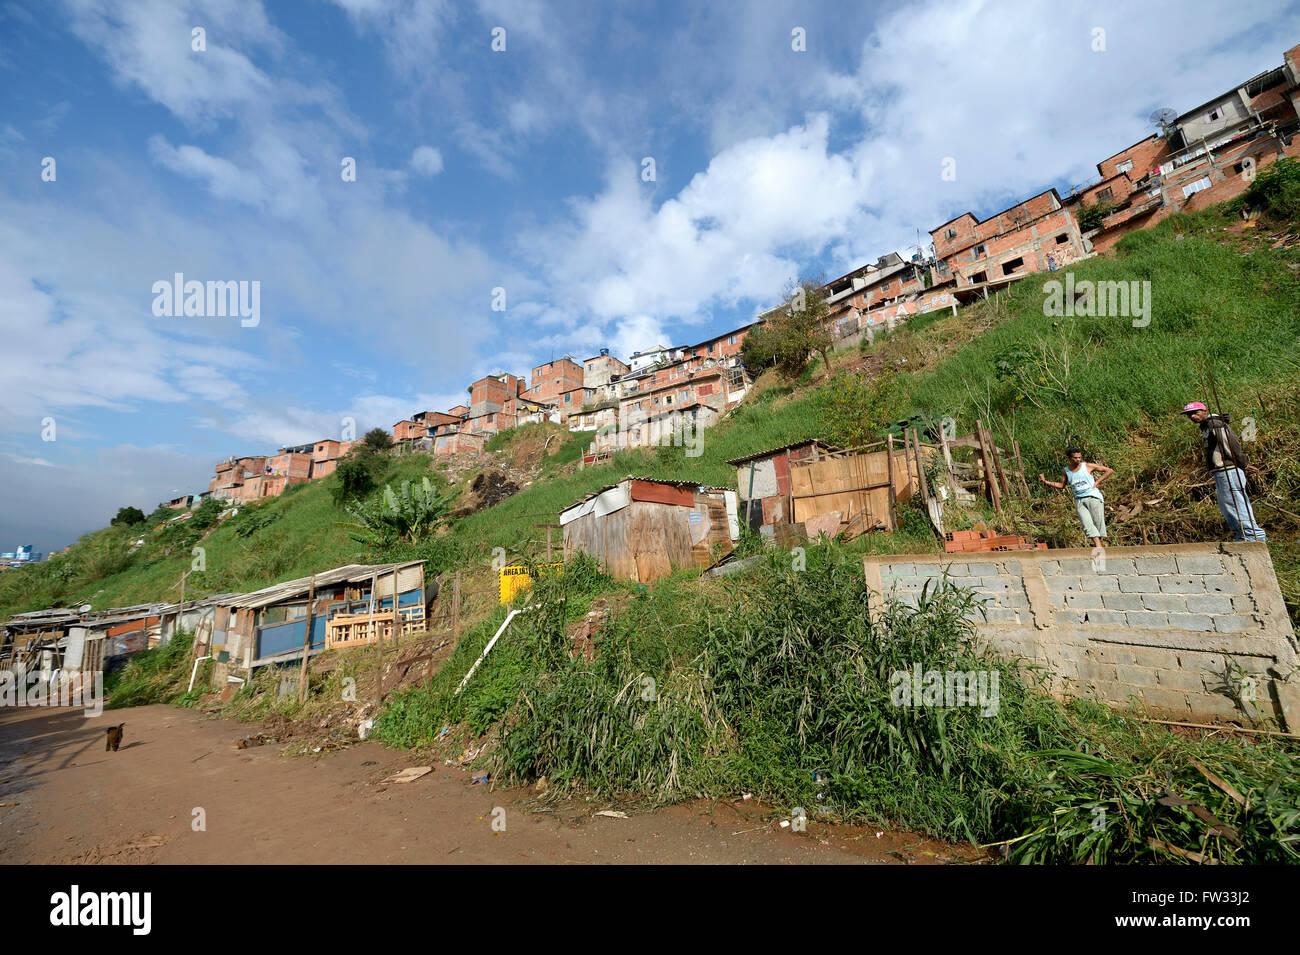 Favela, Sapopemba, Zona Sudeste, Sao Paulo of Brazil - Stock Image